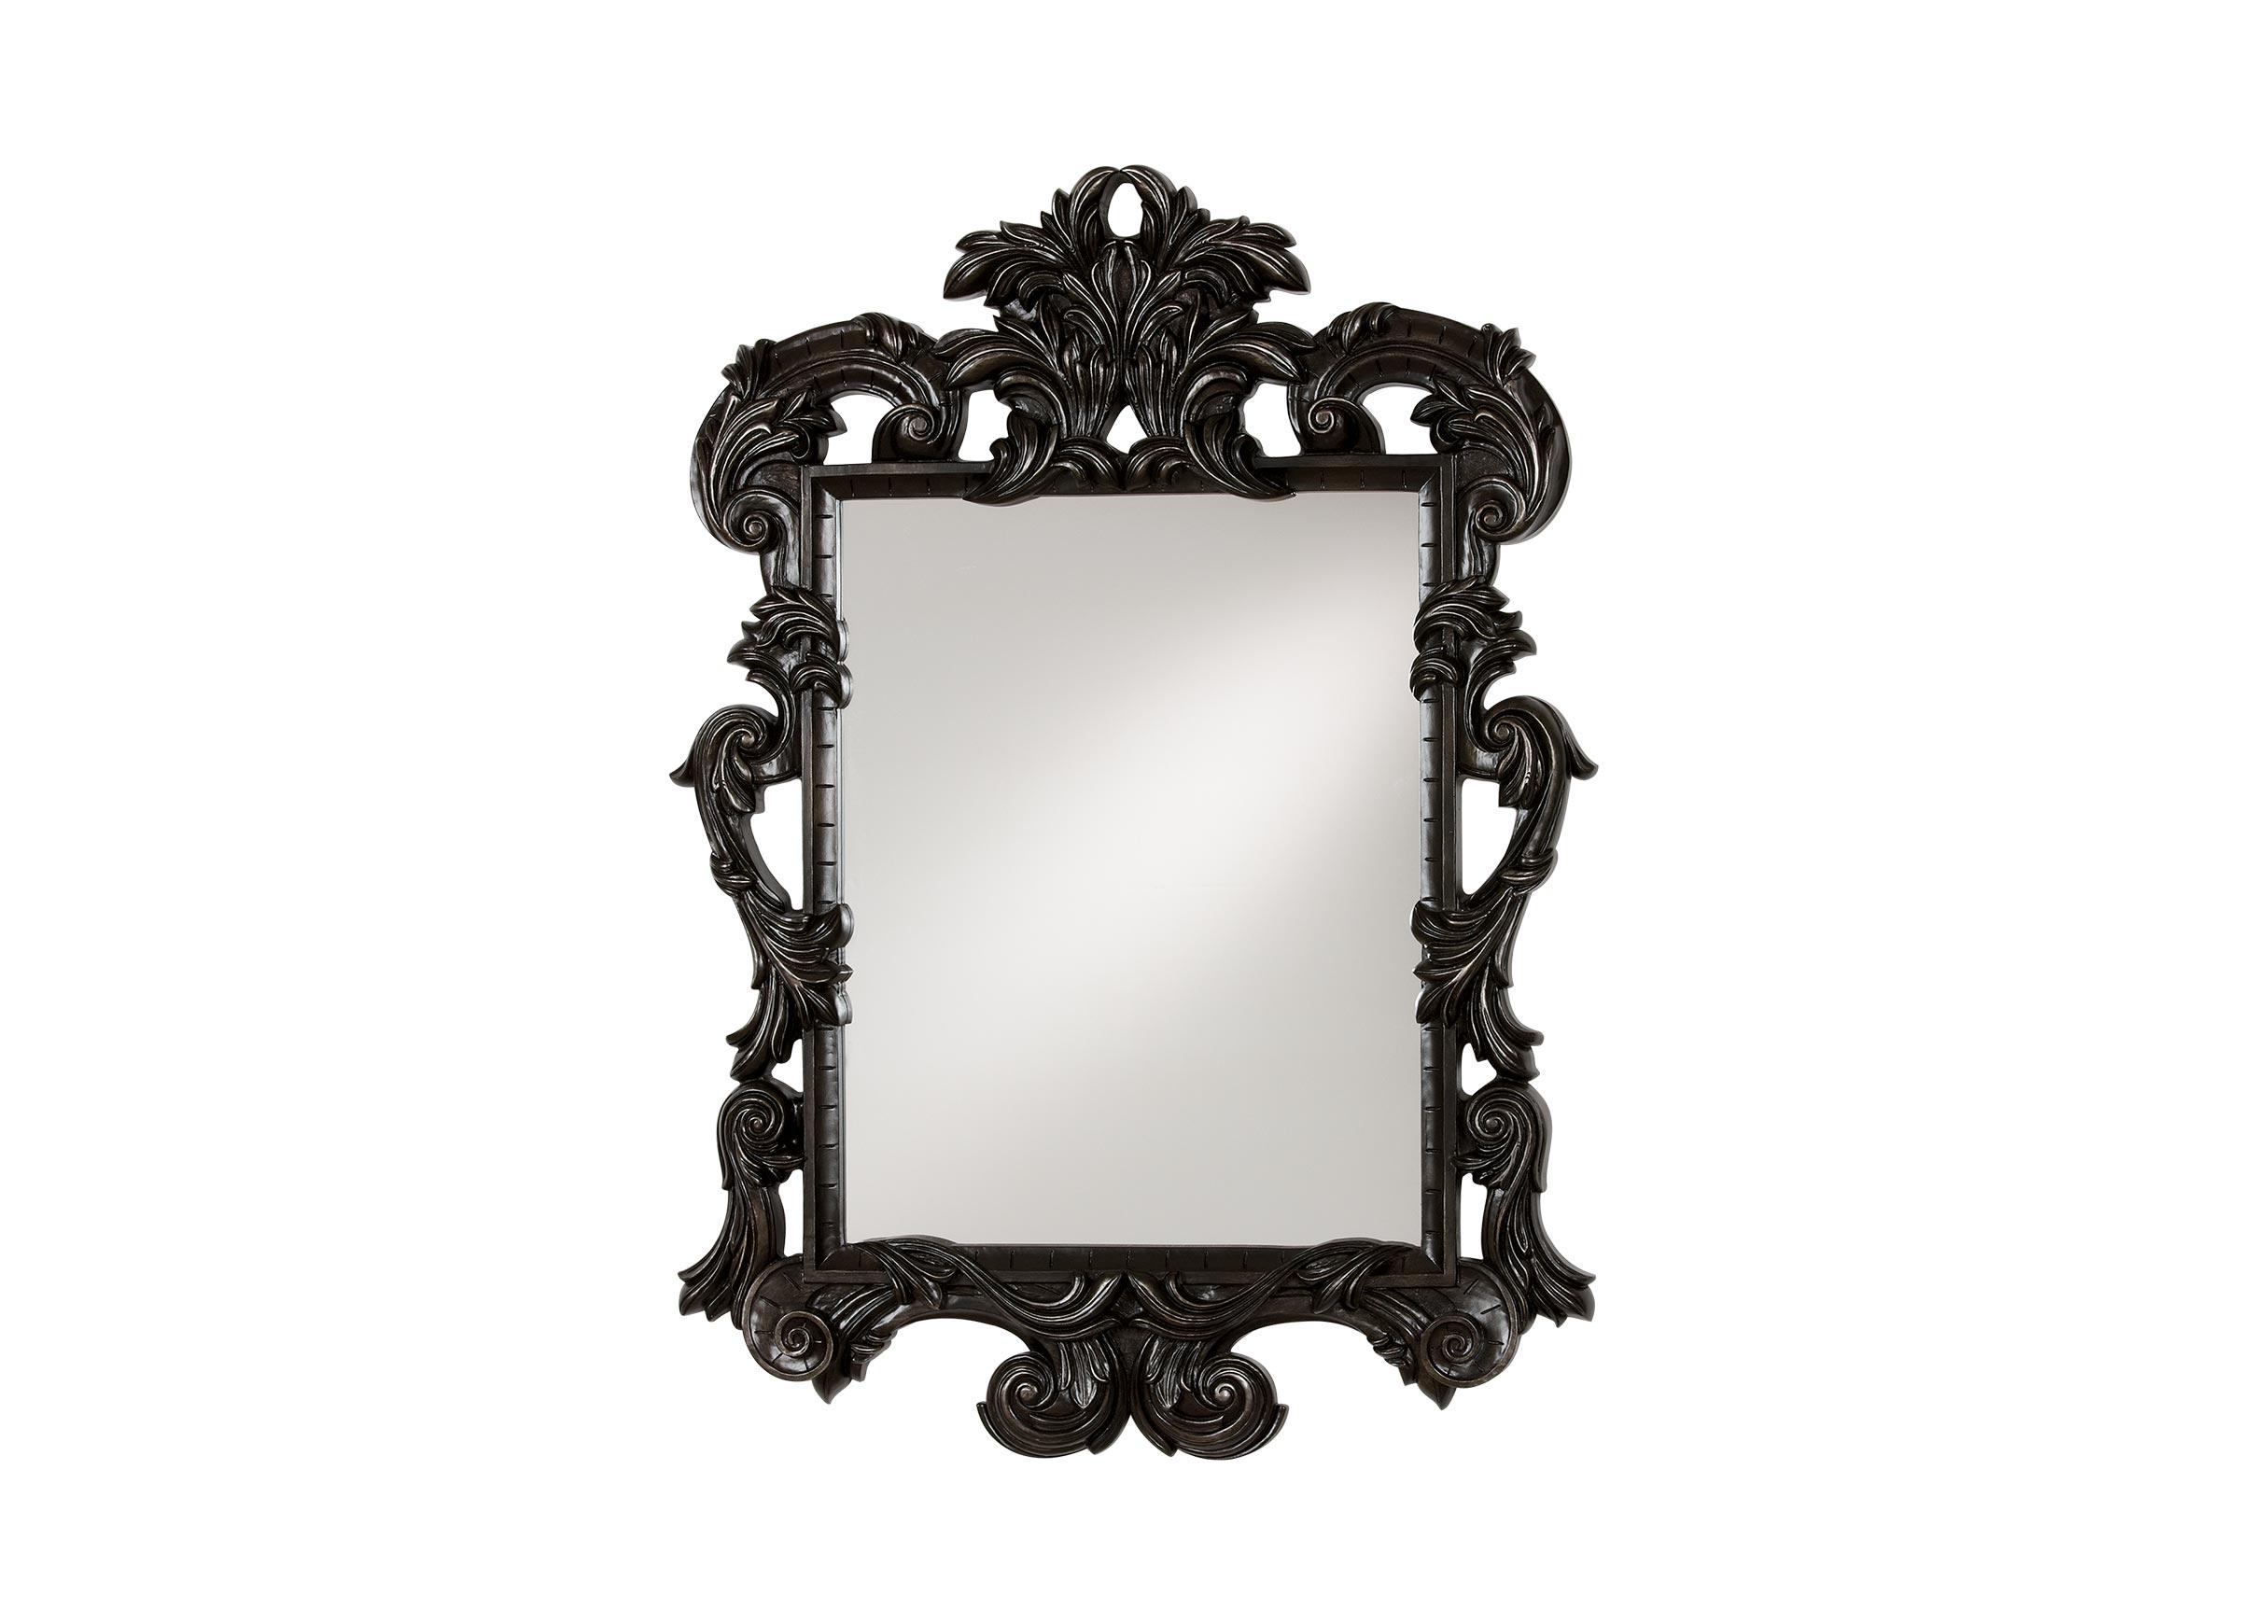 black ornate mirror clearance ethan allen. Black Bedroom Furniture Sets. Home Design Ideas